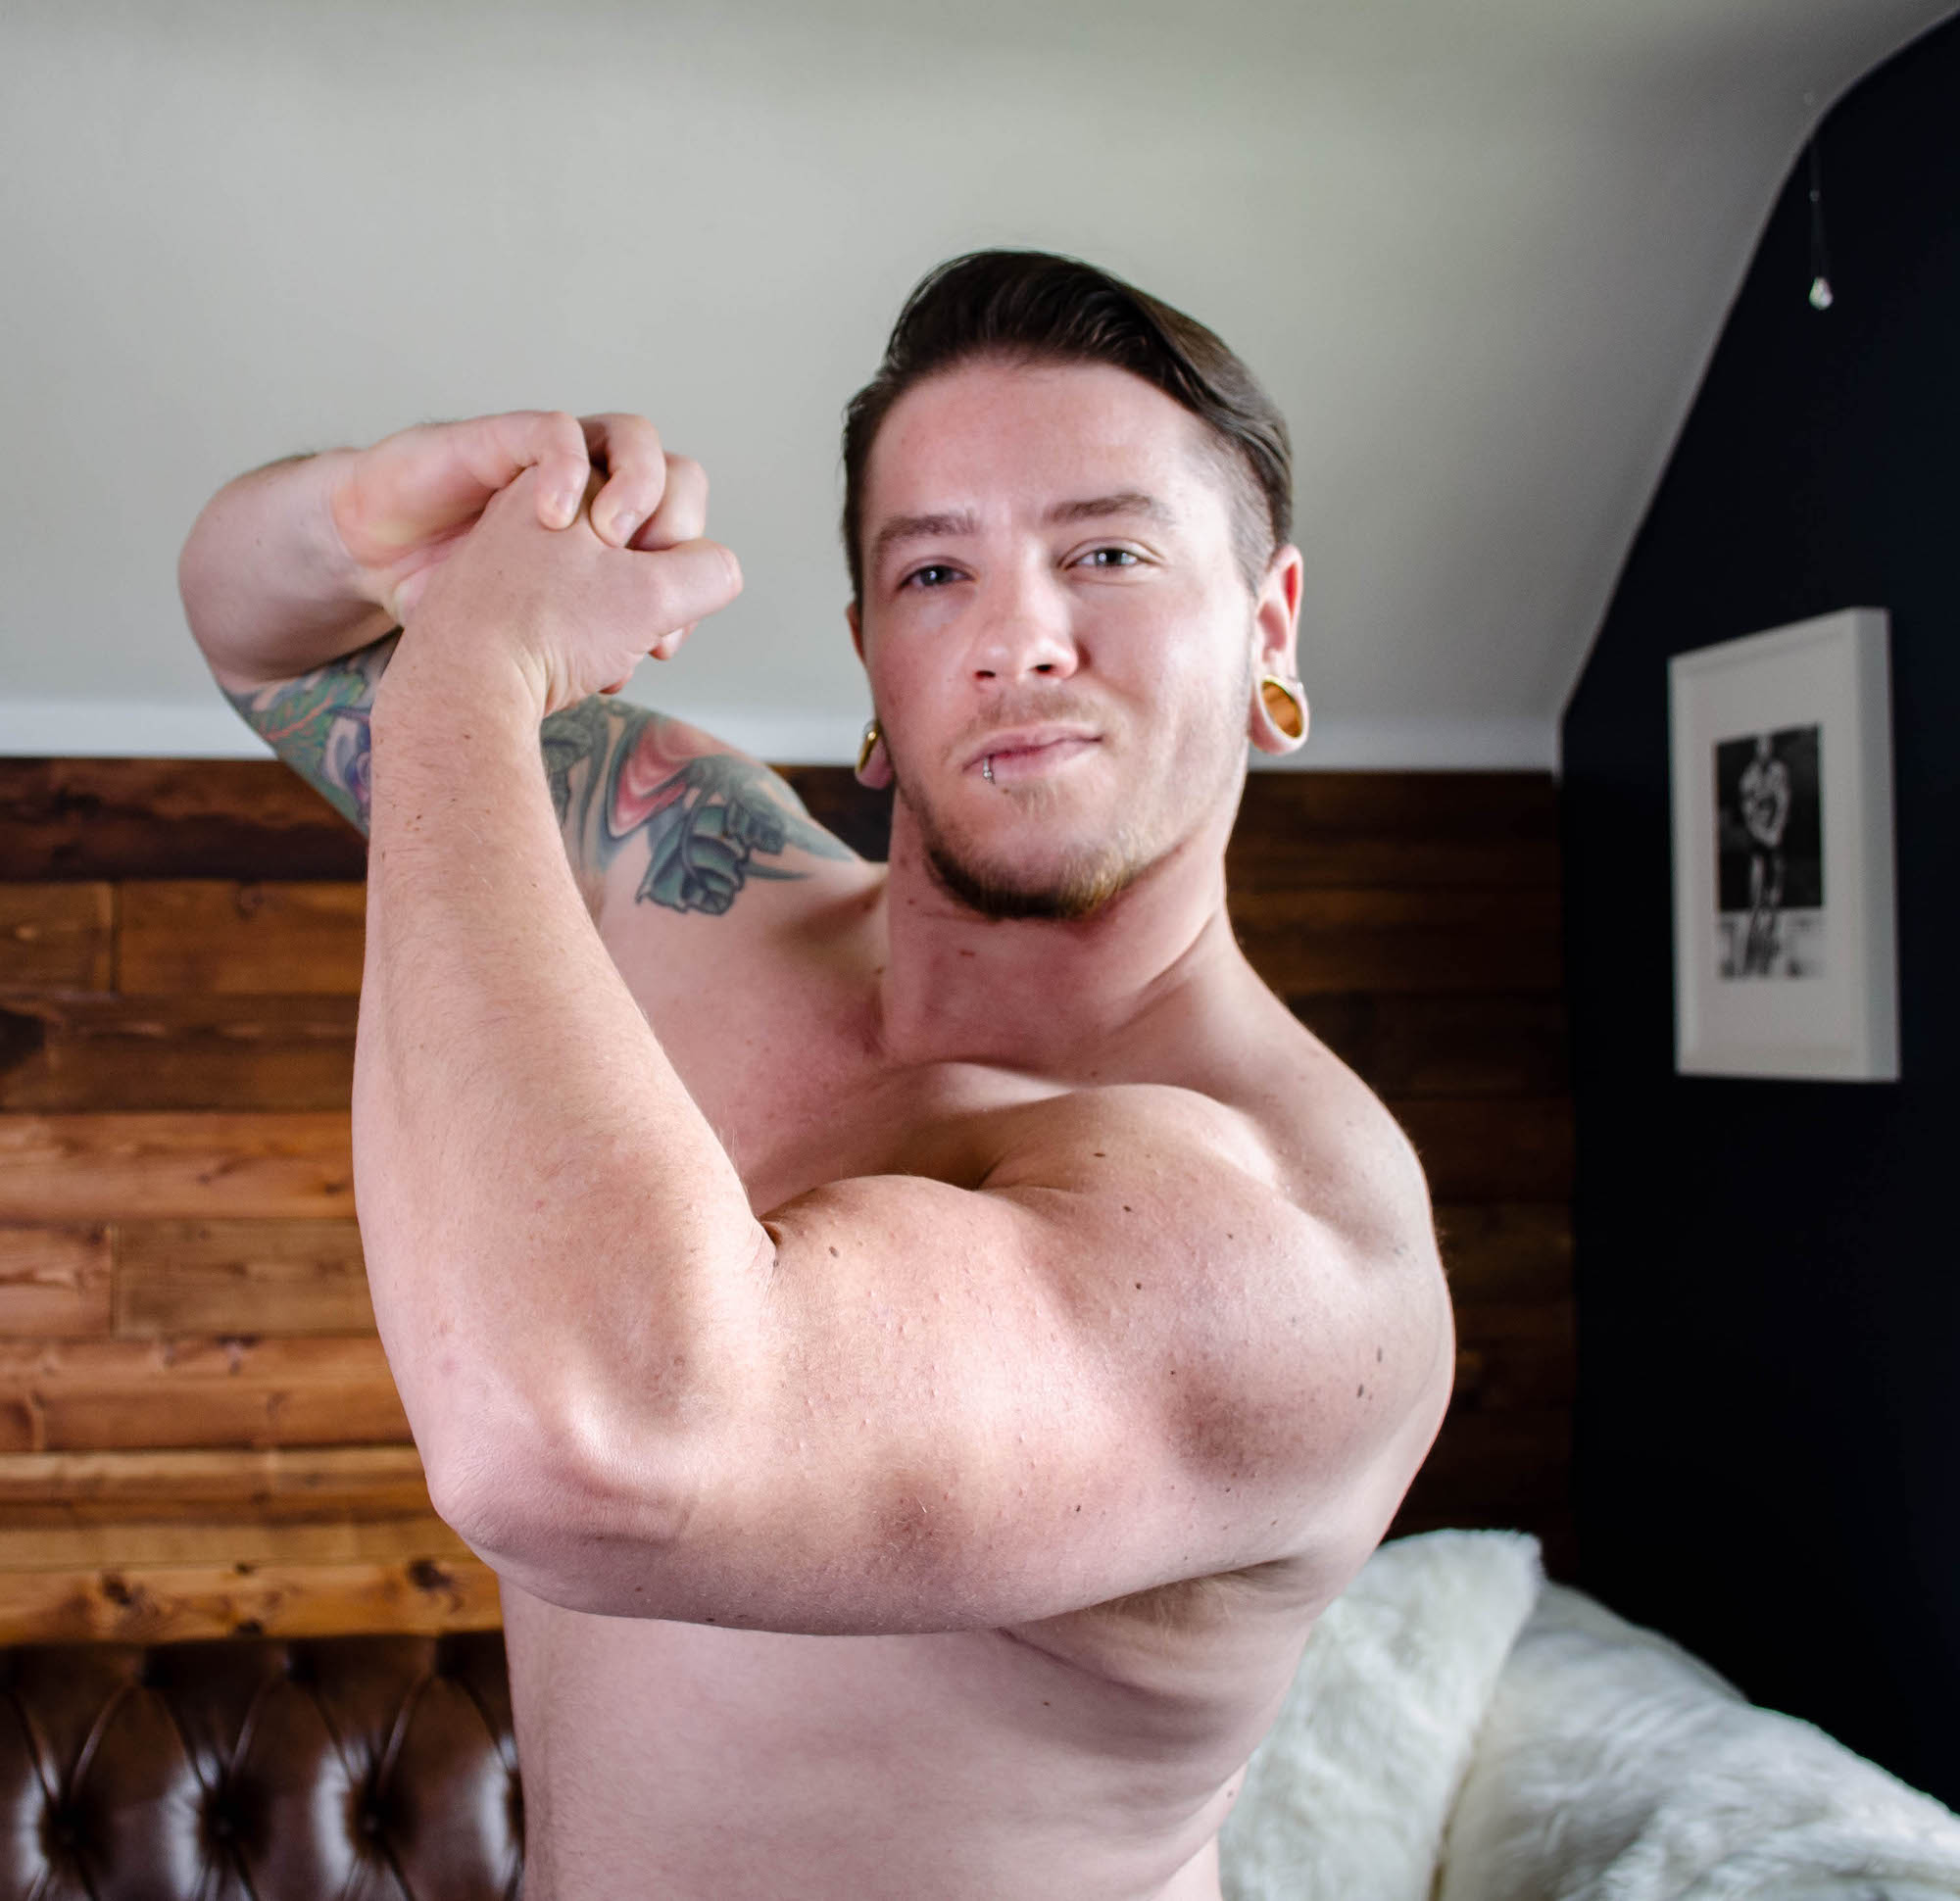 ftm-fitness-bulk-workout-arms